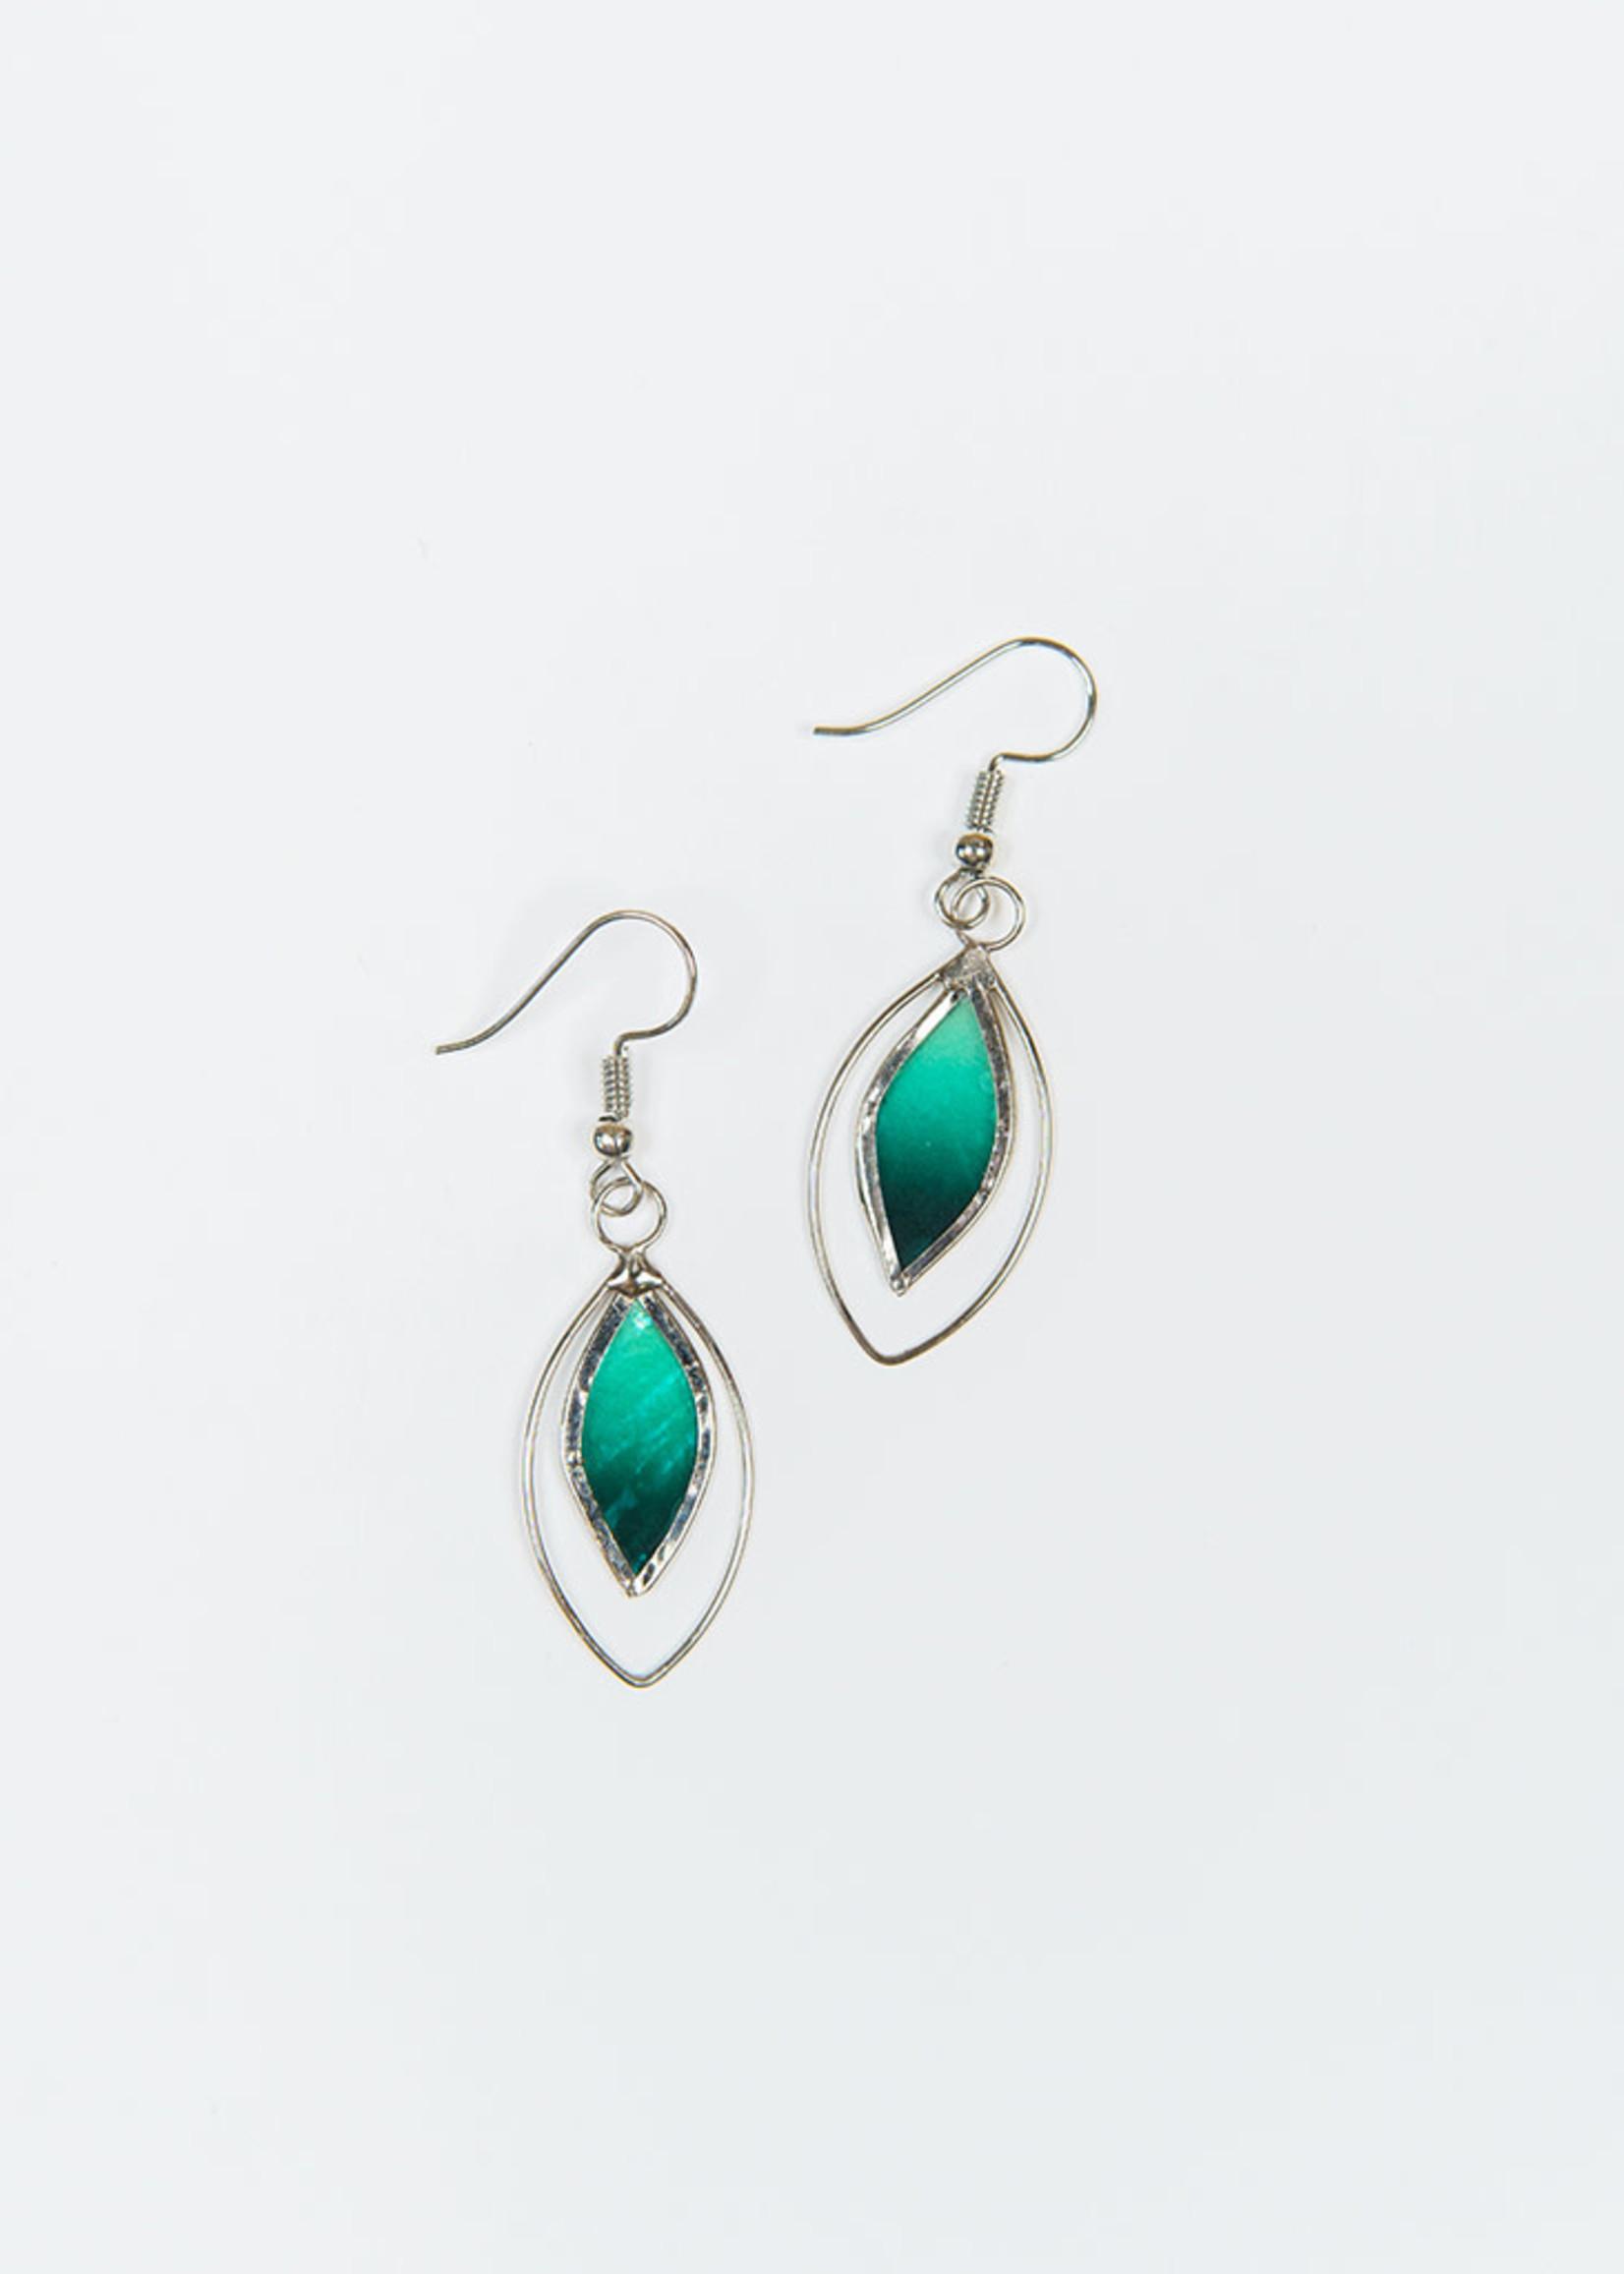 Saffy Handicrafts Green Leaf Earrings